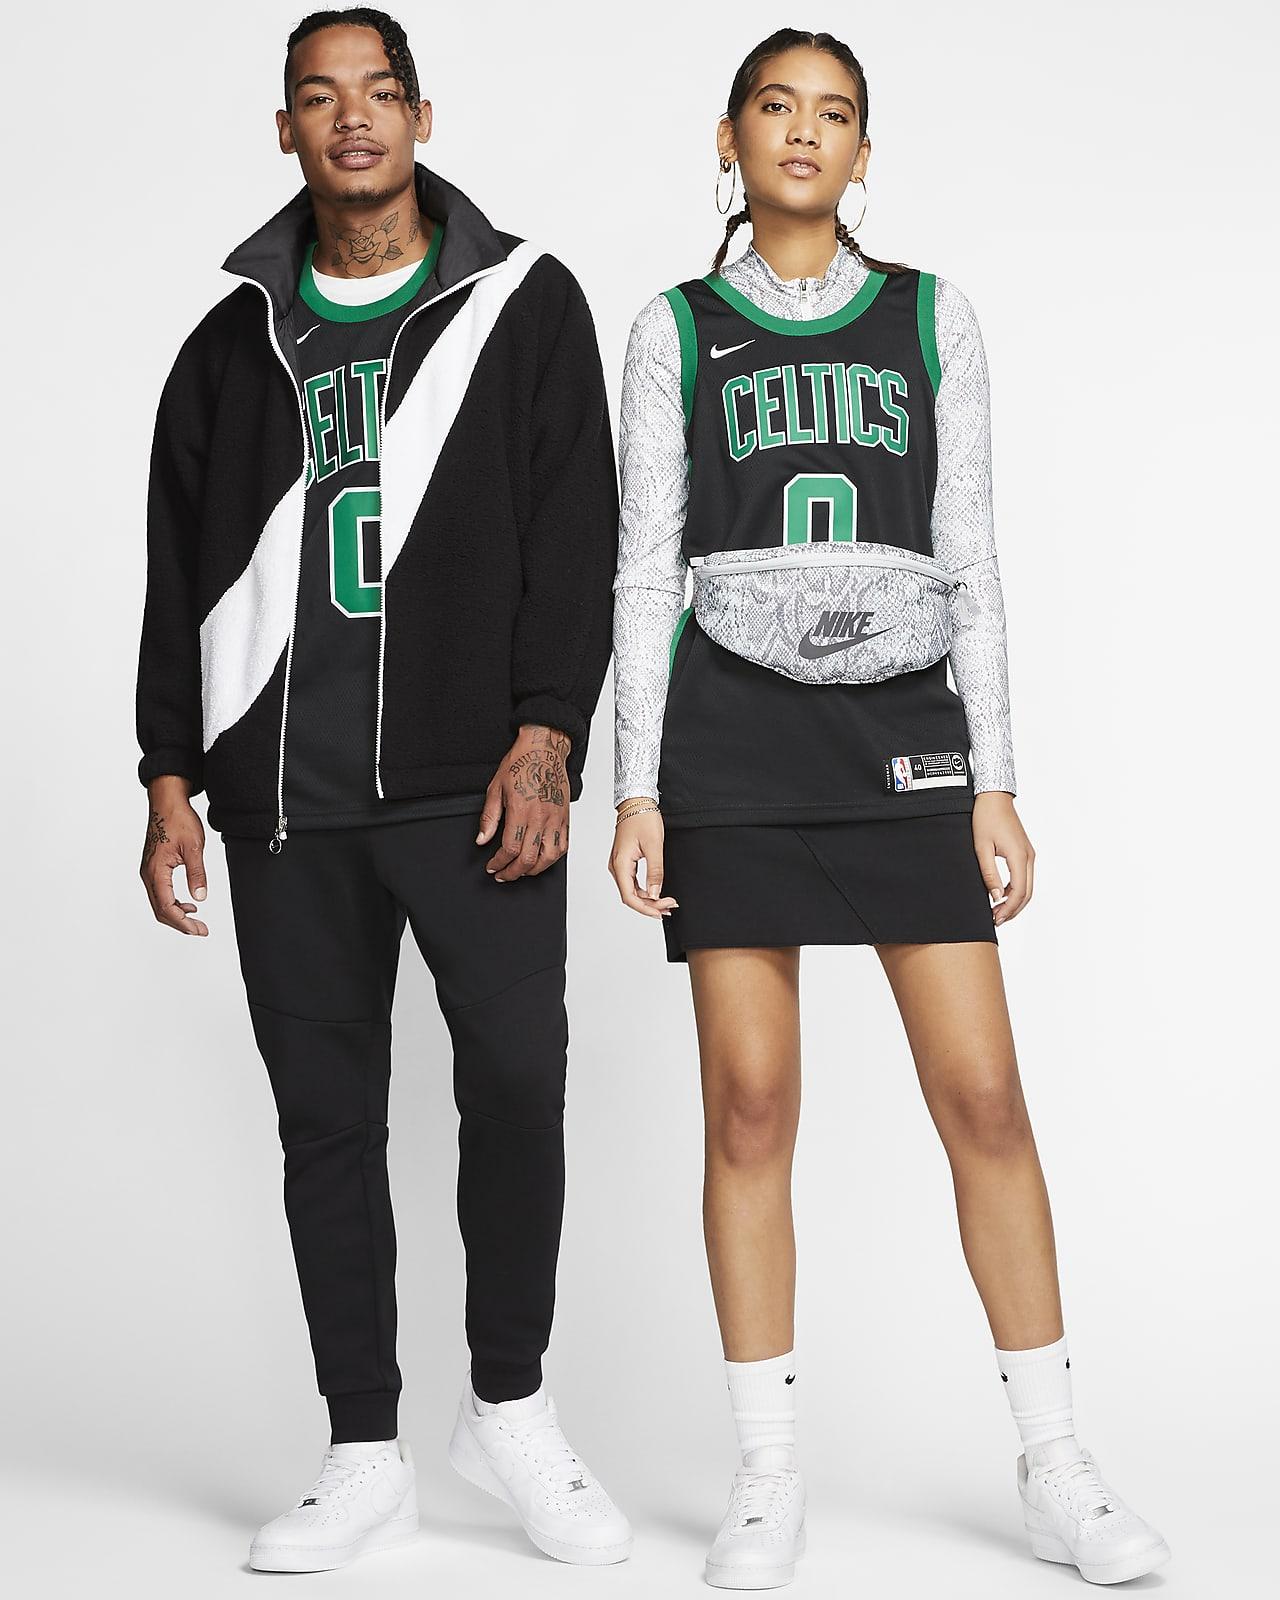 A-lee Camiseta de Baloncesto para Hombre Boston Celtics #0 Jayson Tatum Bordado Swingman Transpirable y Resistente al Desgaste Camiseta para Fan